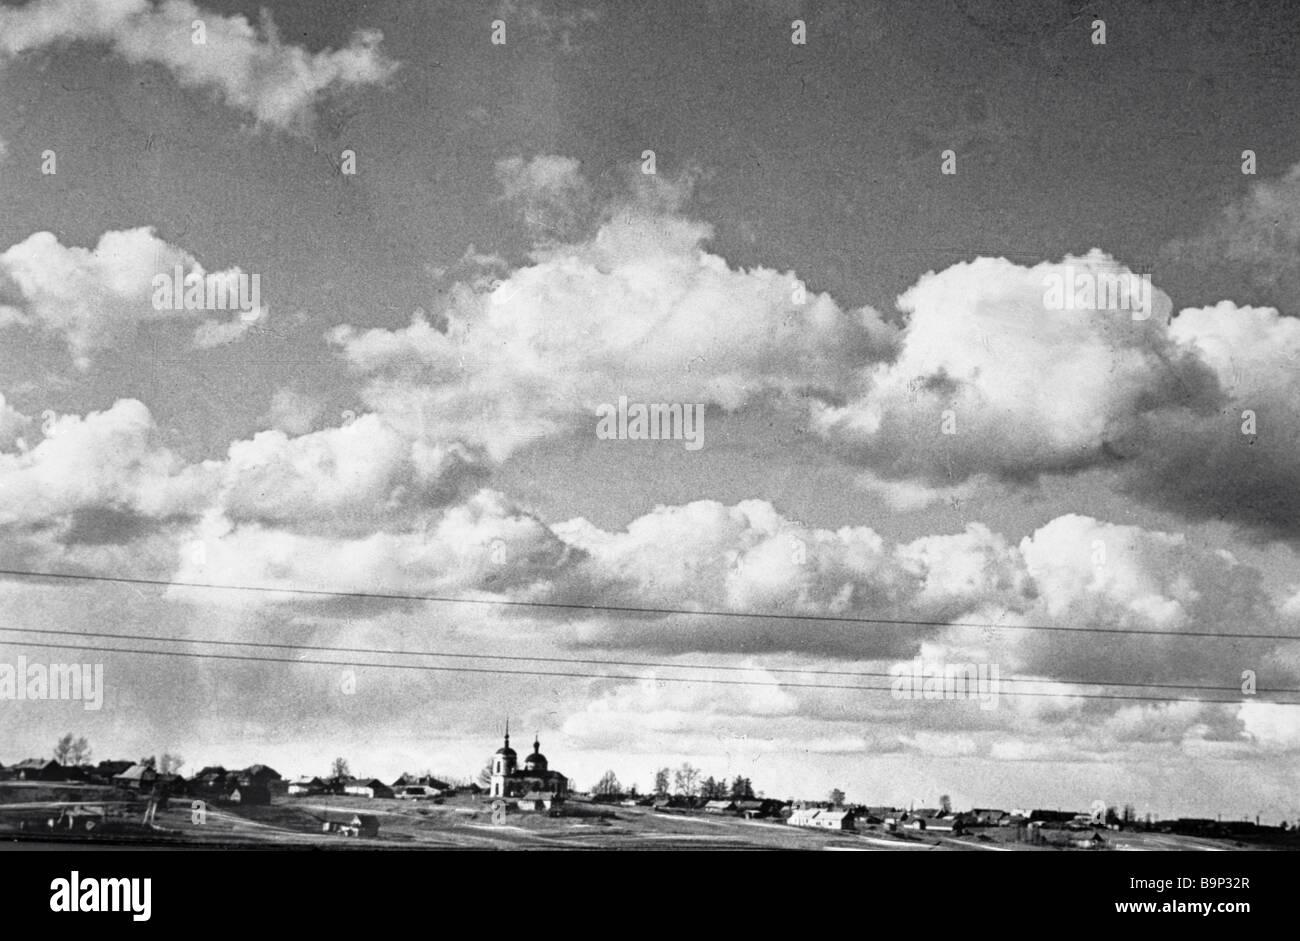 A landscape photographed by Nikita Khrushchev Stock Photo